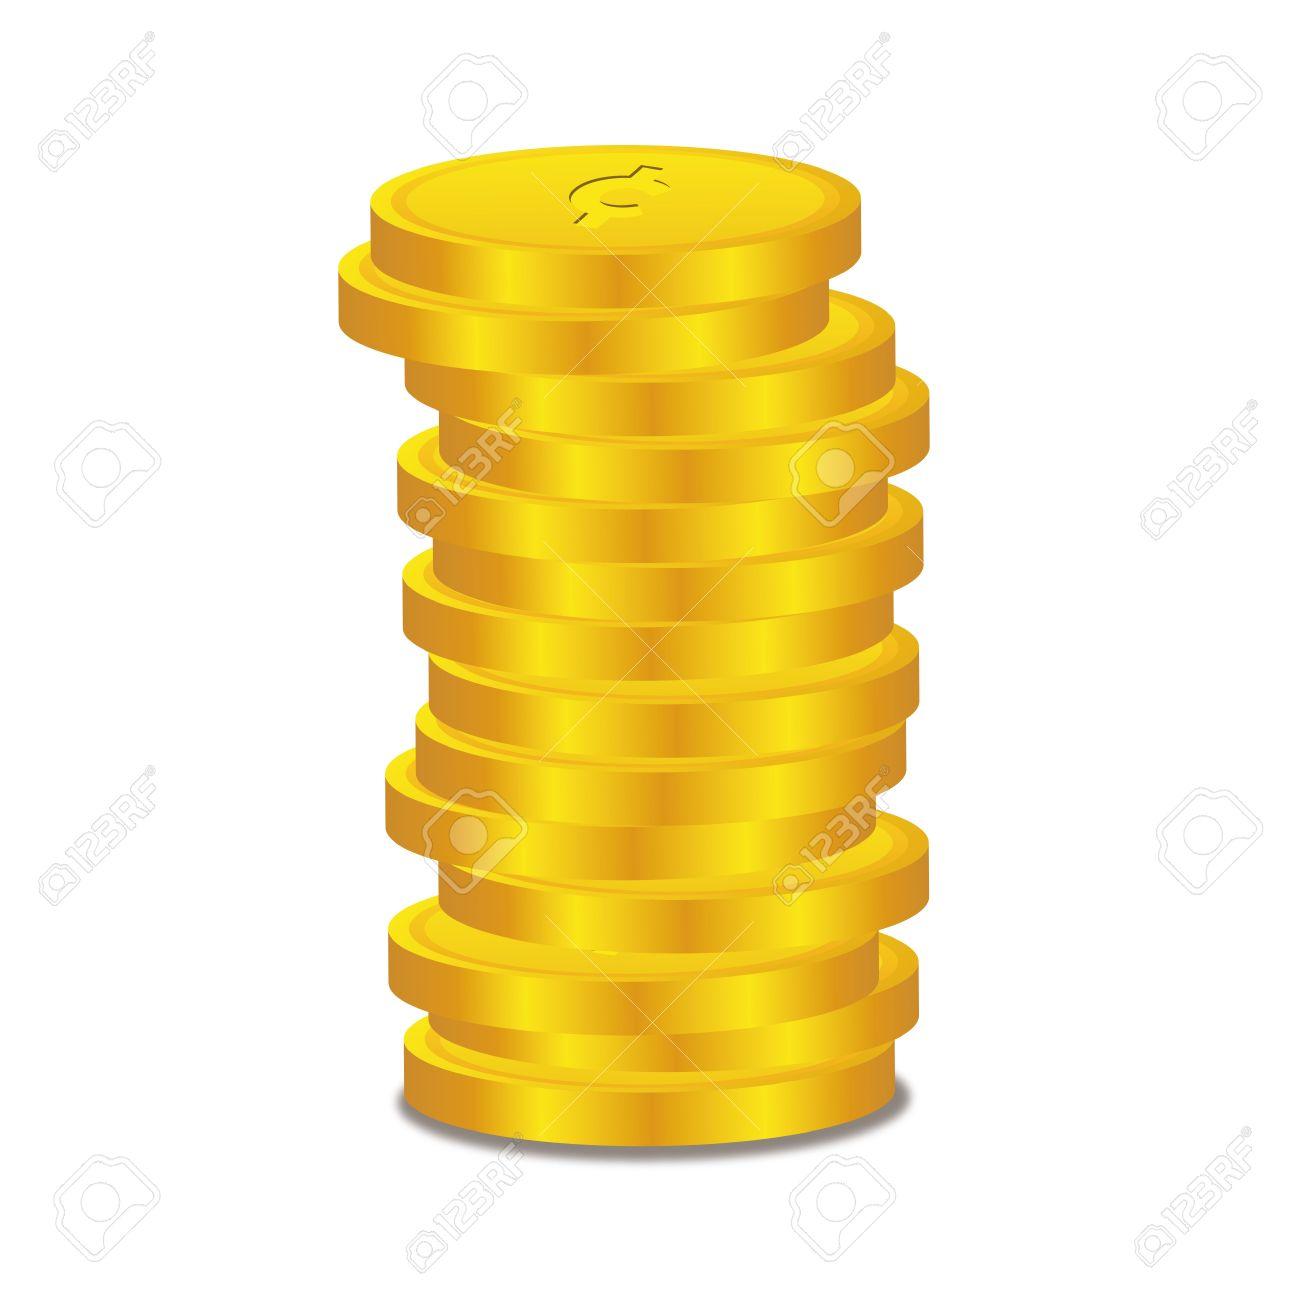 Bank credit coin capital credits gold money tal euro vector bank credit coin capital credits gold money tal euro vector rewarding sweetheart symbol credit stock vector buycottarizona Image collections